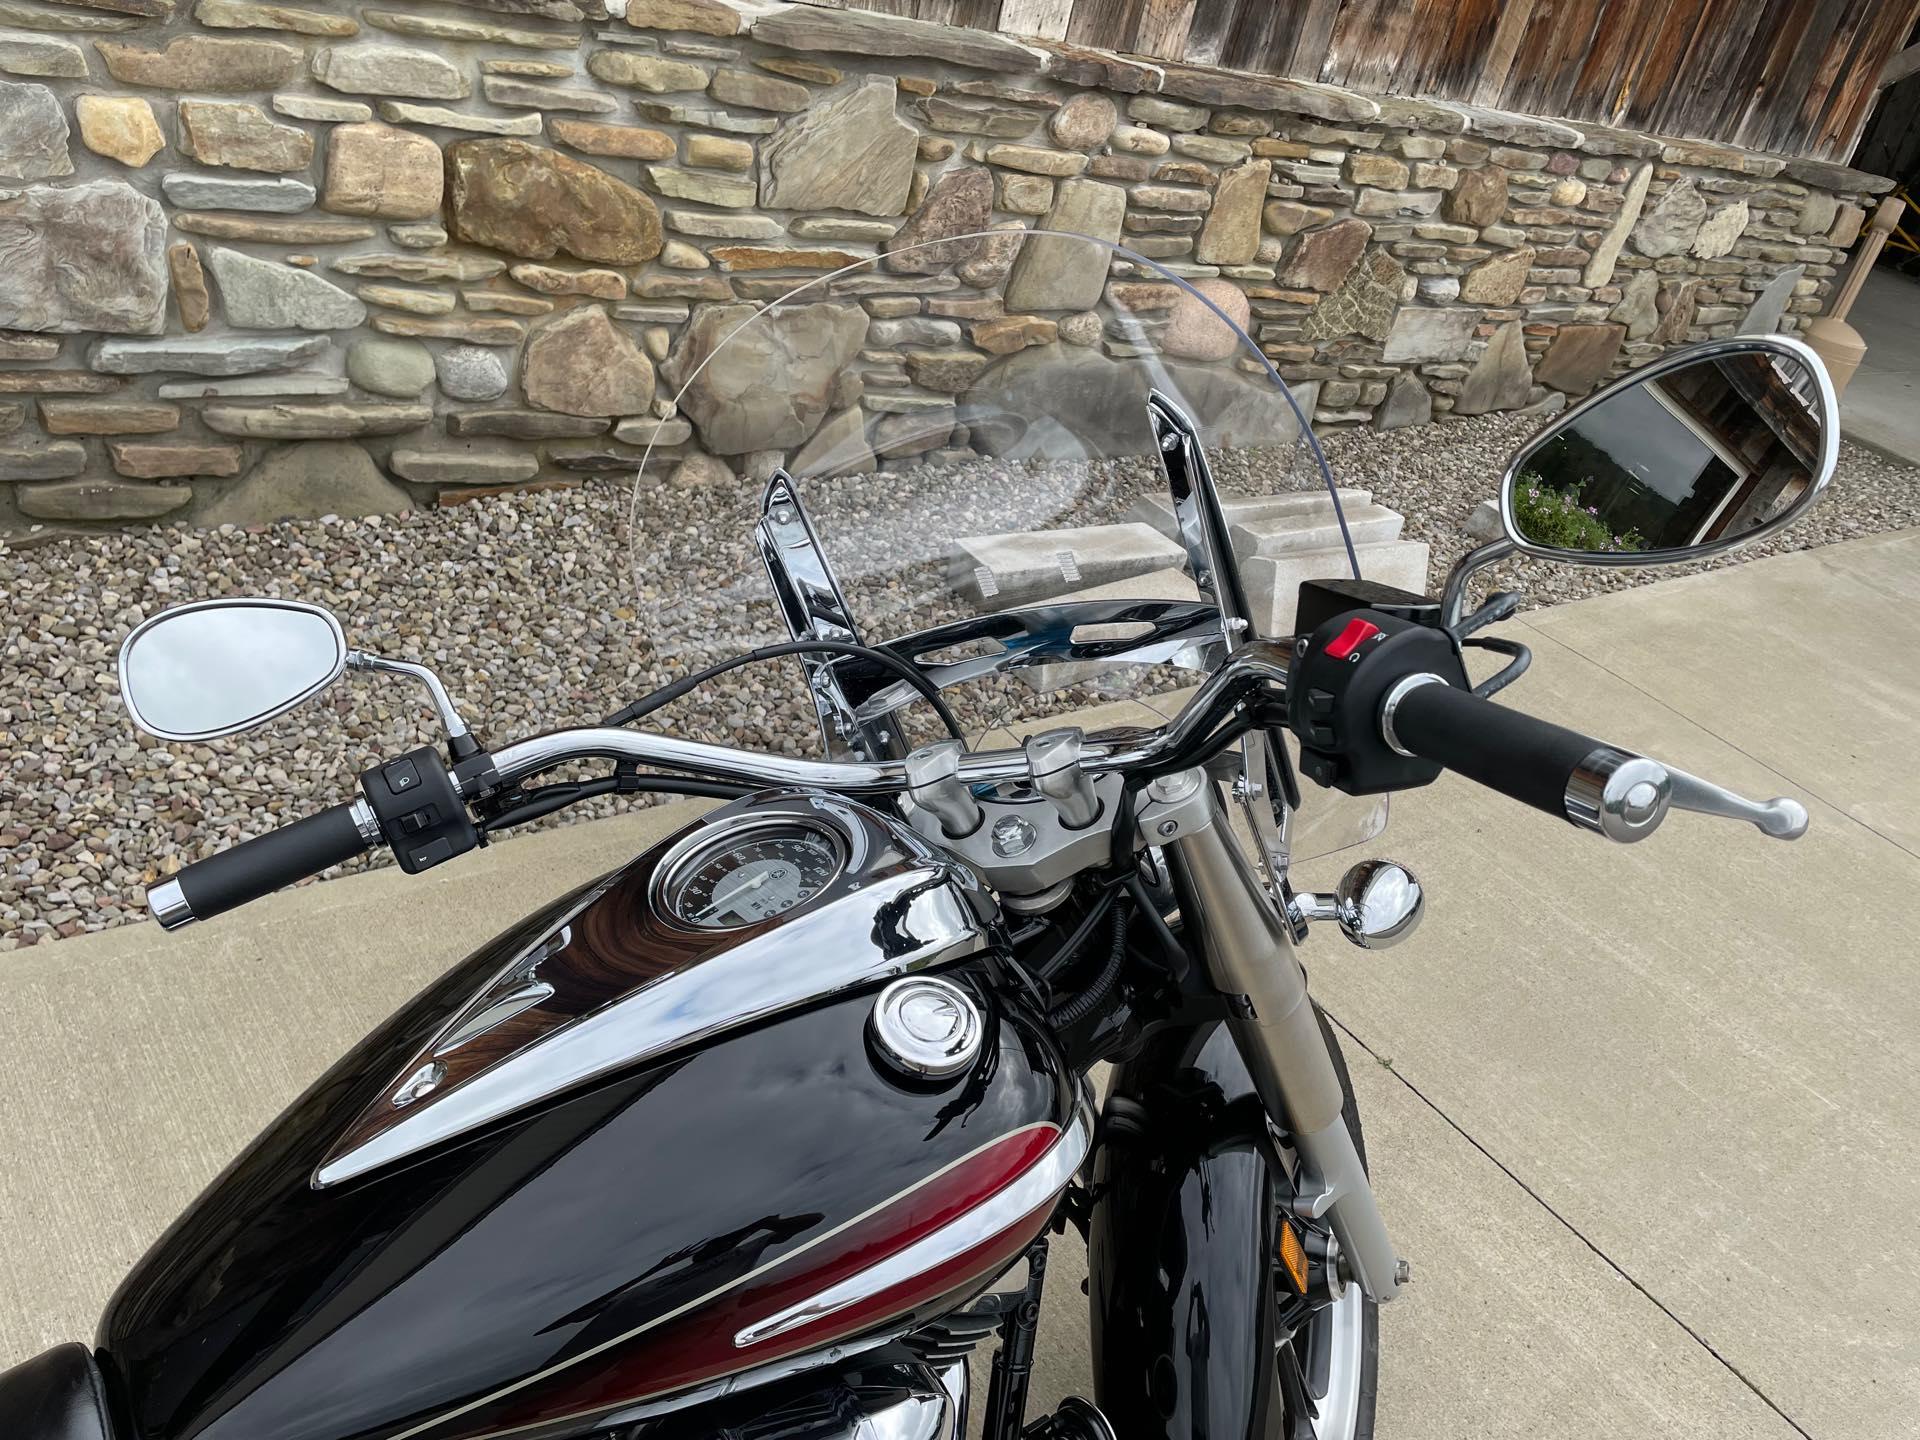 2014 Yamaha V Star 950 Tourer at Arkport Cycles